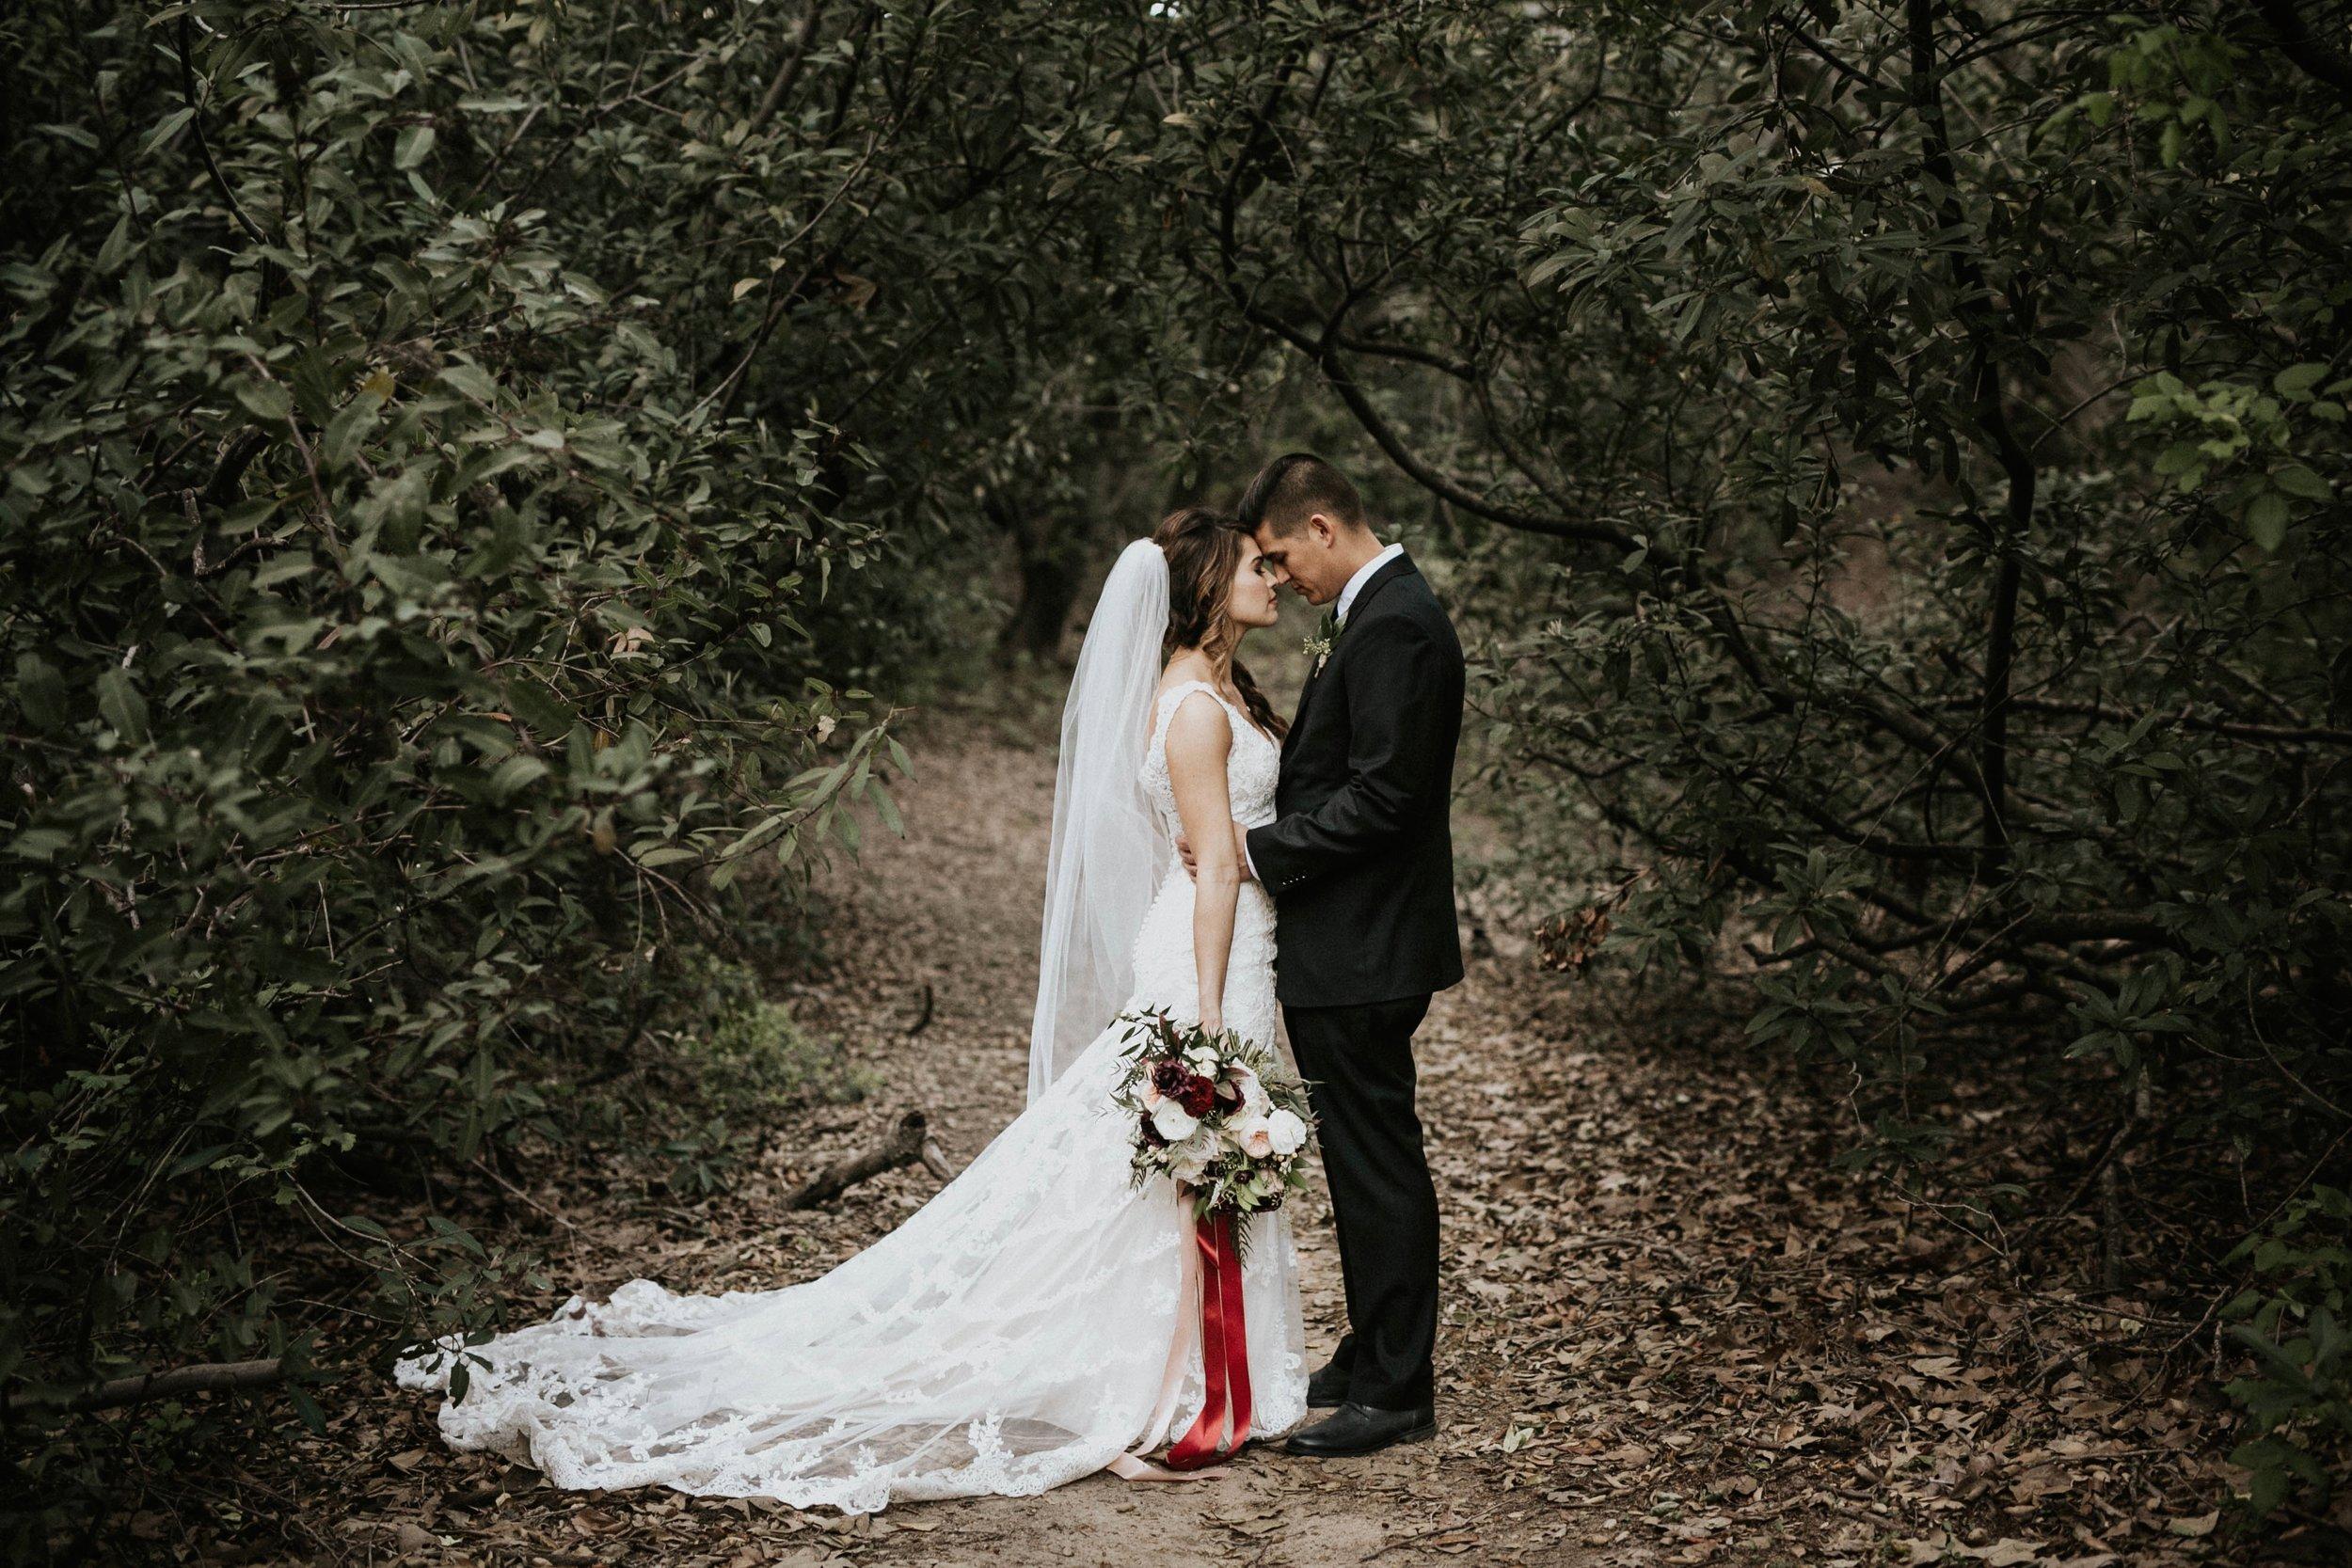 devynbenmarried-slideshow-085.JPG